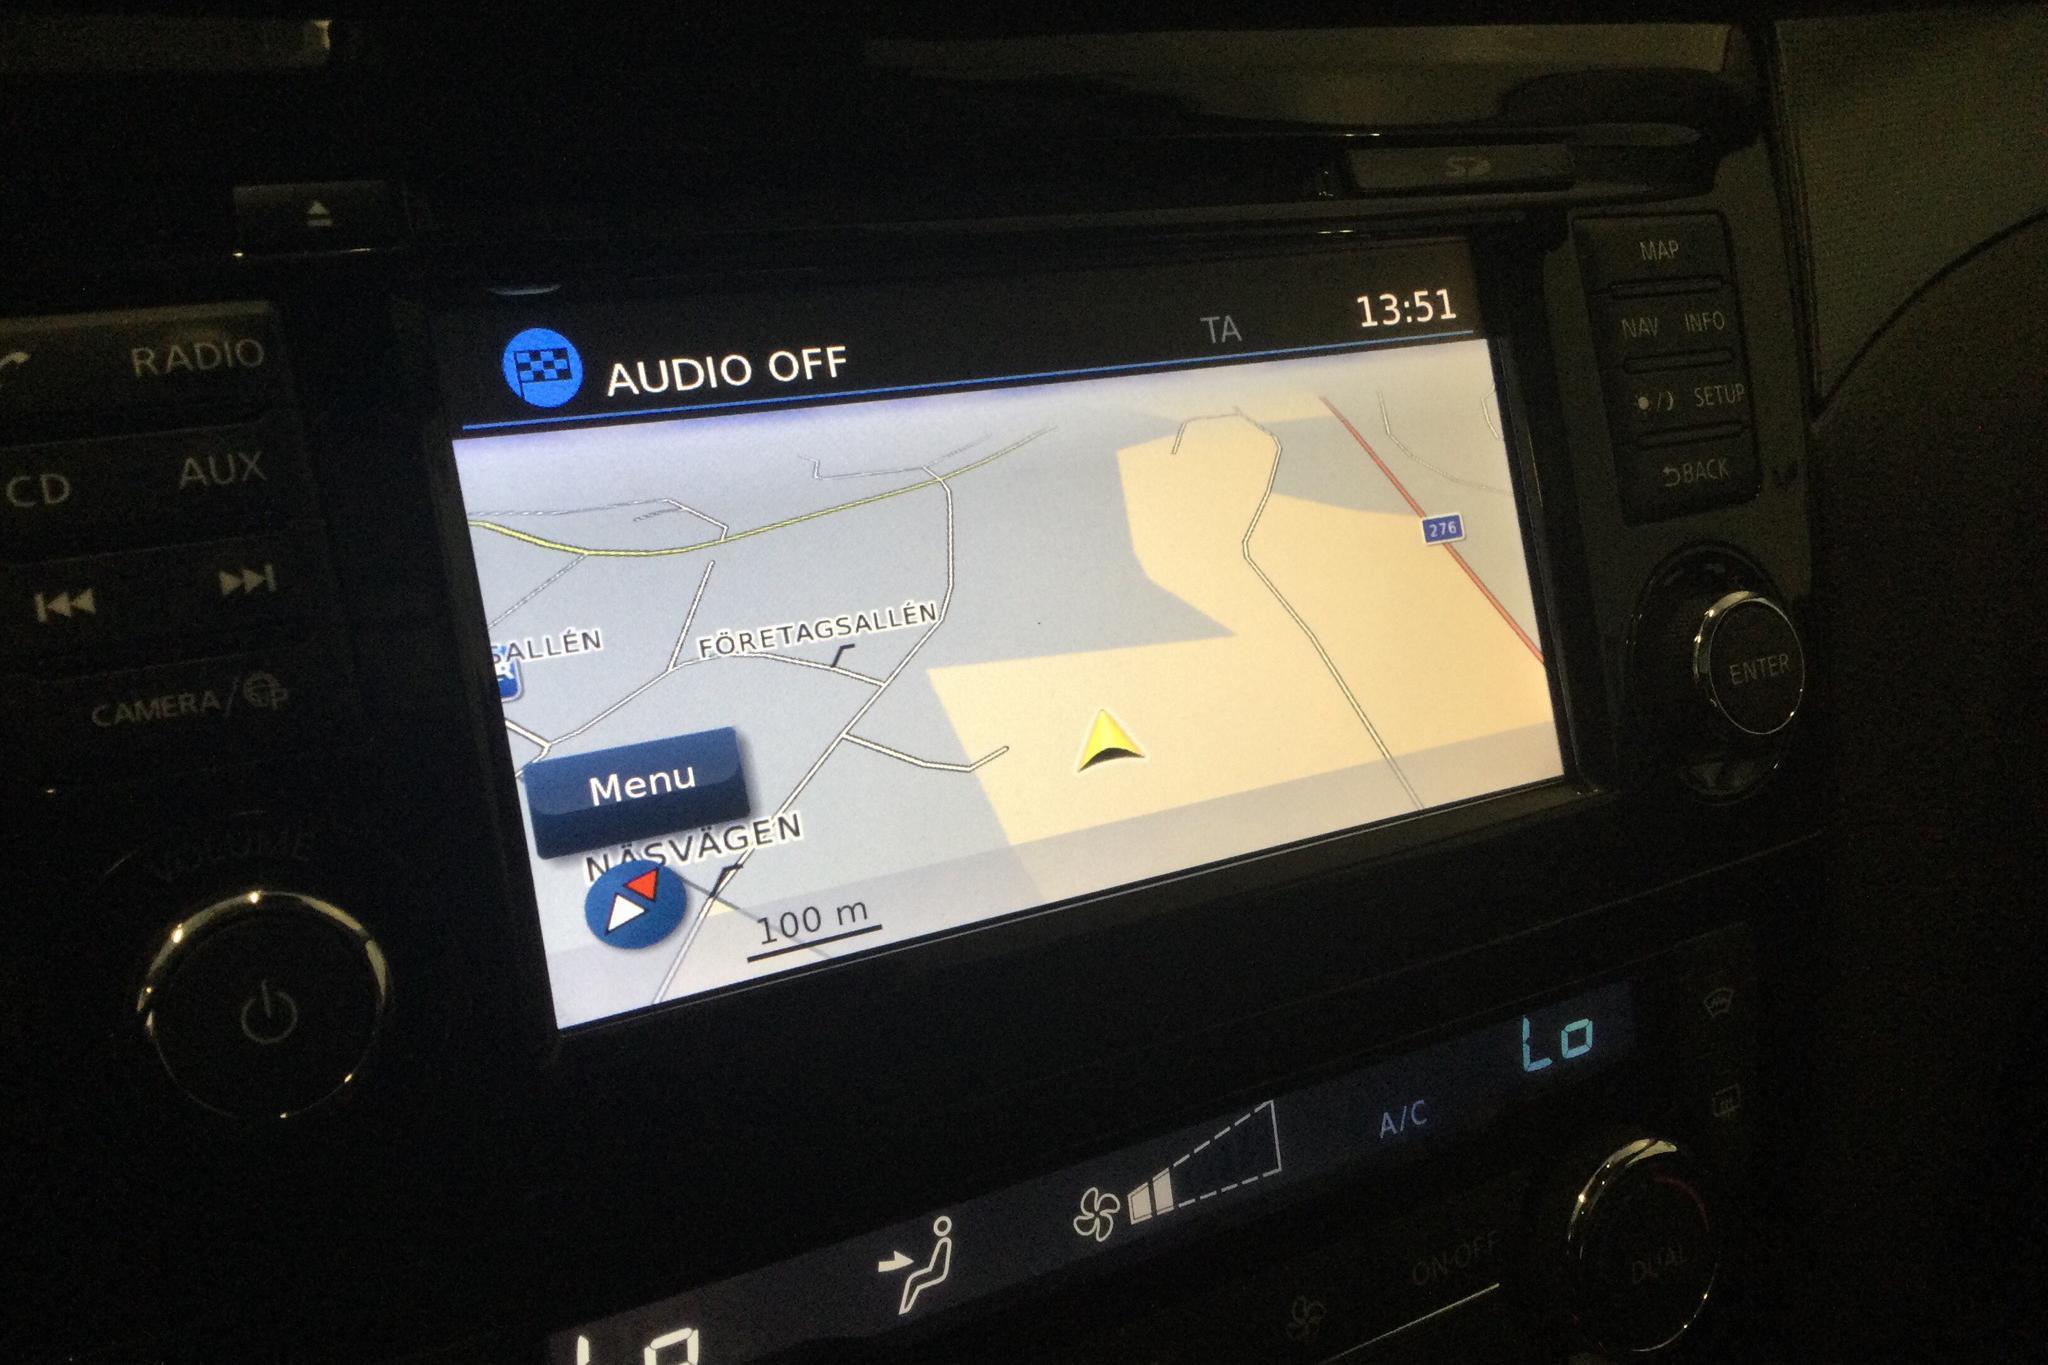 Nissan Qashqai 1.5 dCi (110hk) - 3 879 mil - Manuell - brun - 2018